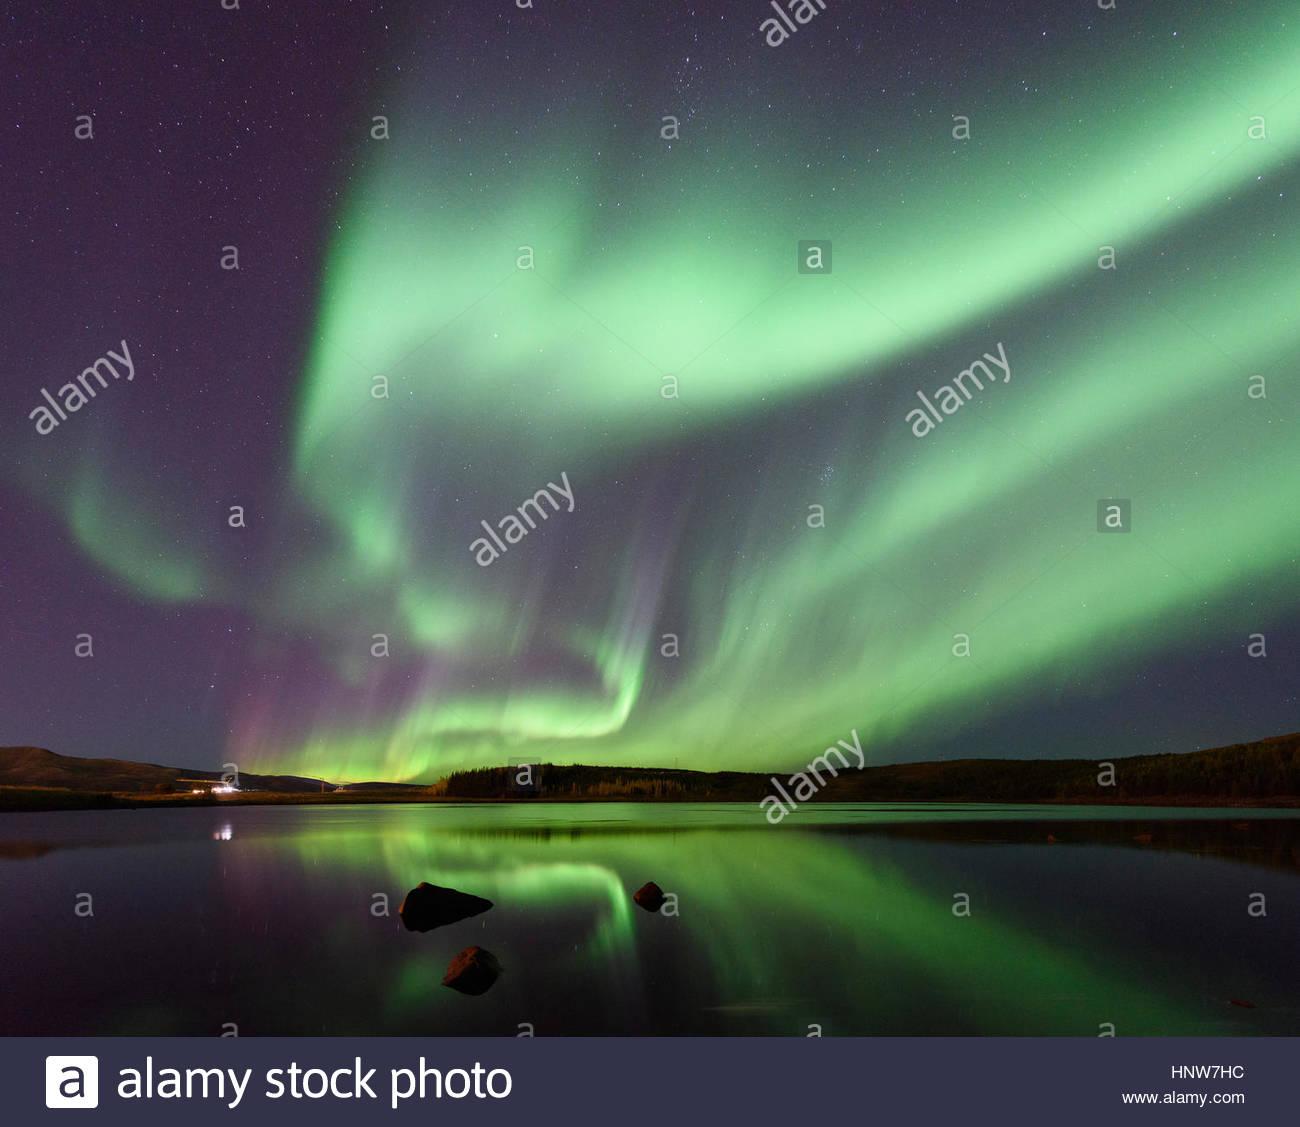 Aurora borealis over water at night, Thingvellir, Iceland - Stock Image